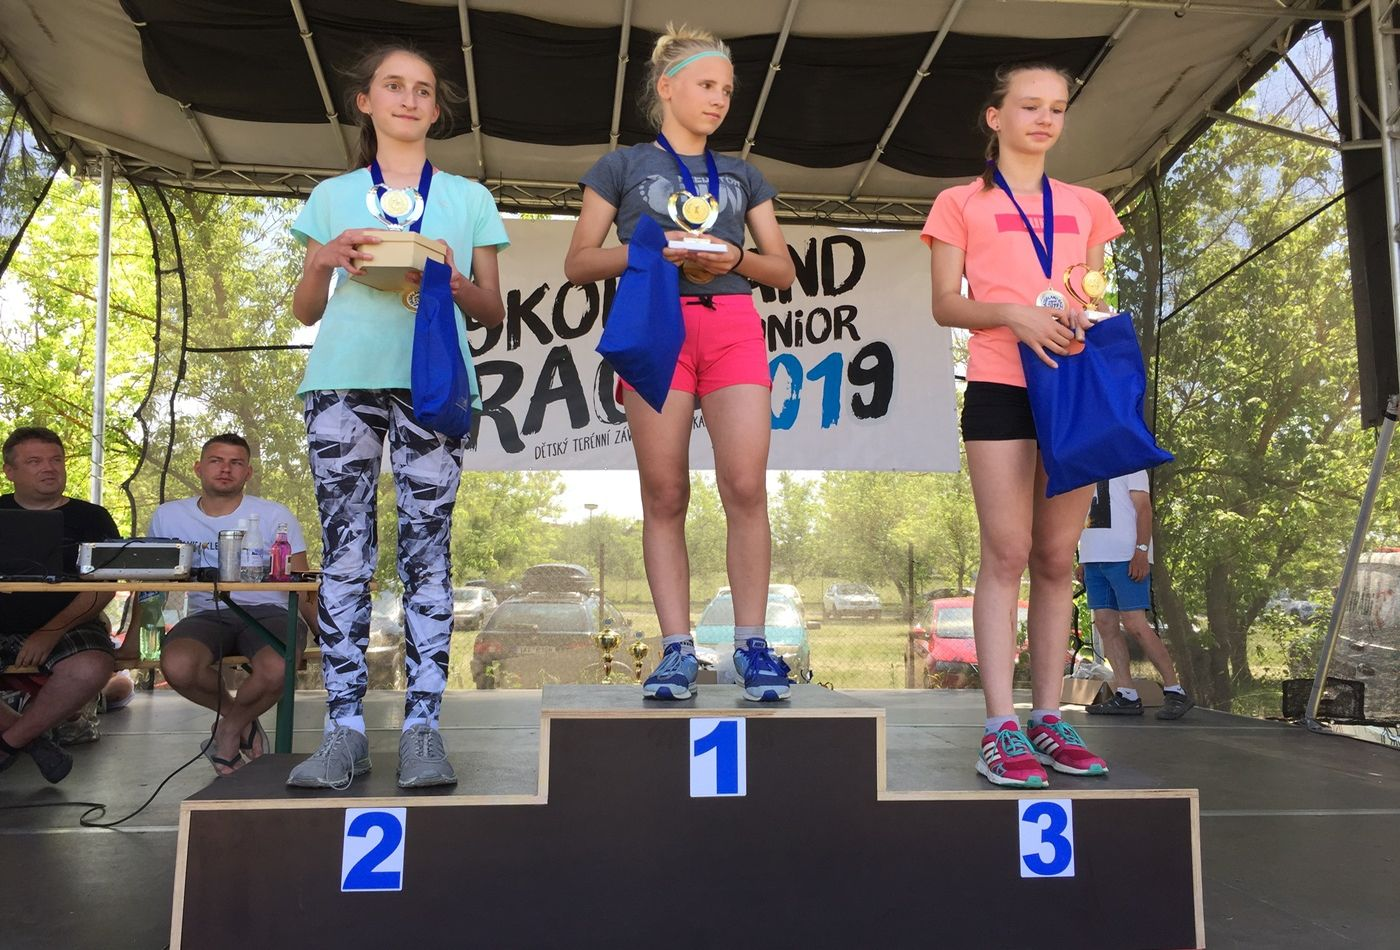 Škodaland-Race-Junior-716